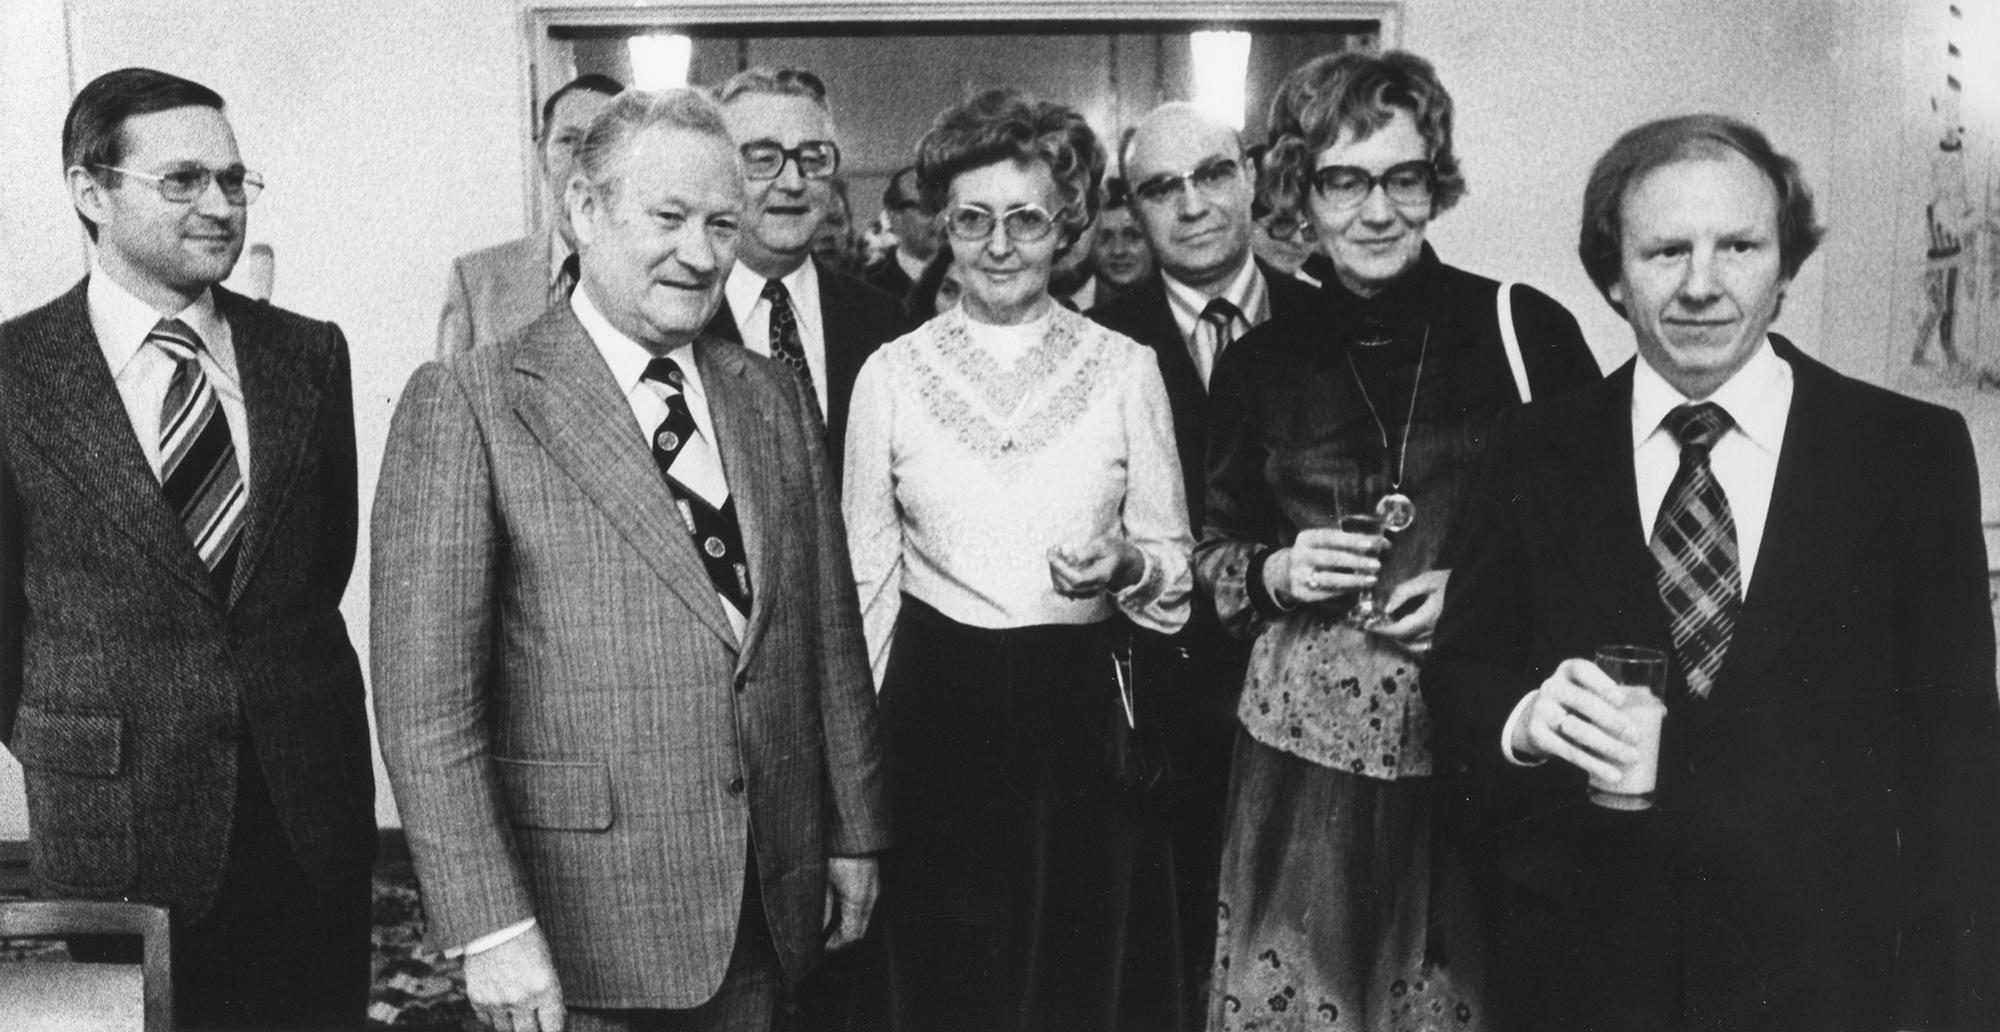 Marianne Englert 1977 in Essen (mit Bogumil OB Katzor Kröll Carlies Rohlmann Gerhard Mantwill)